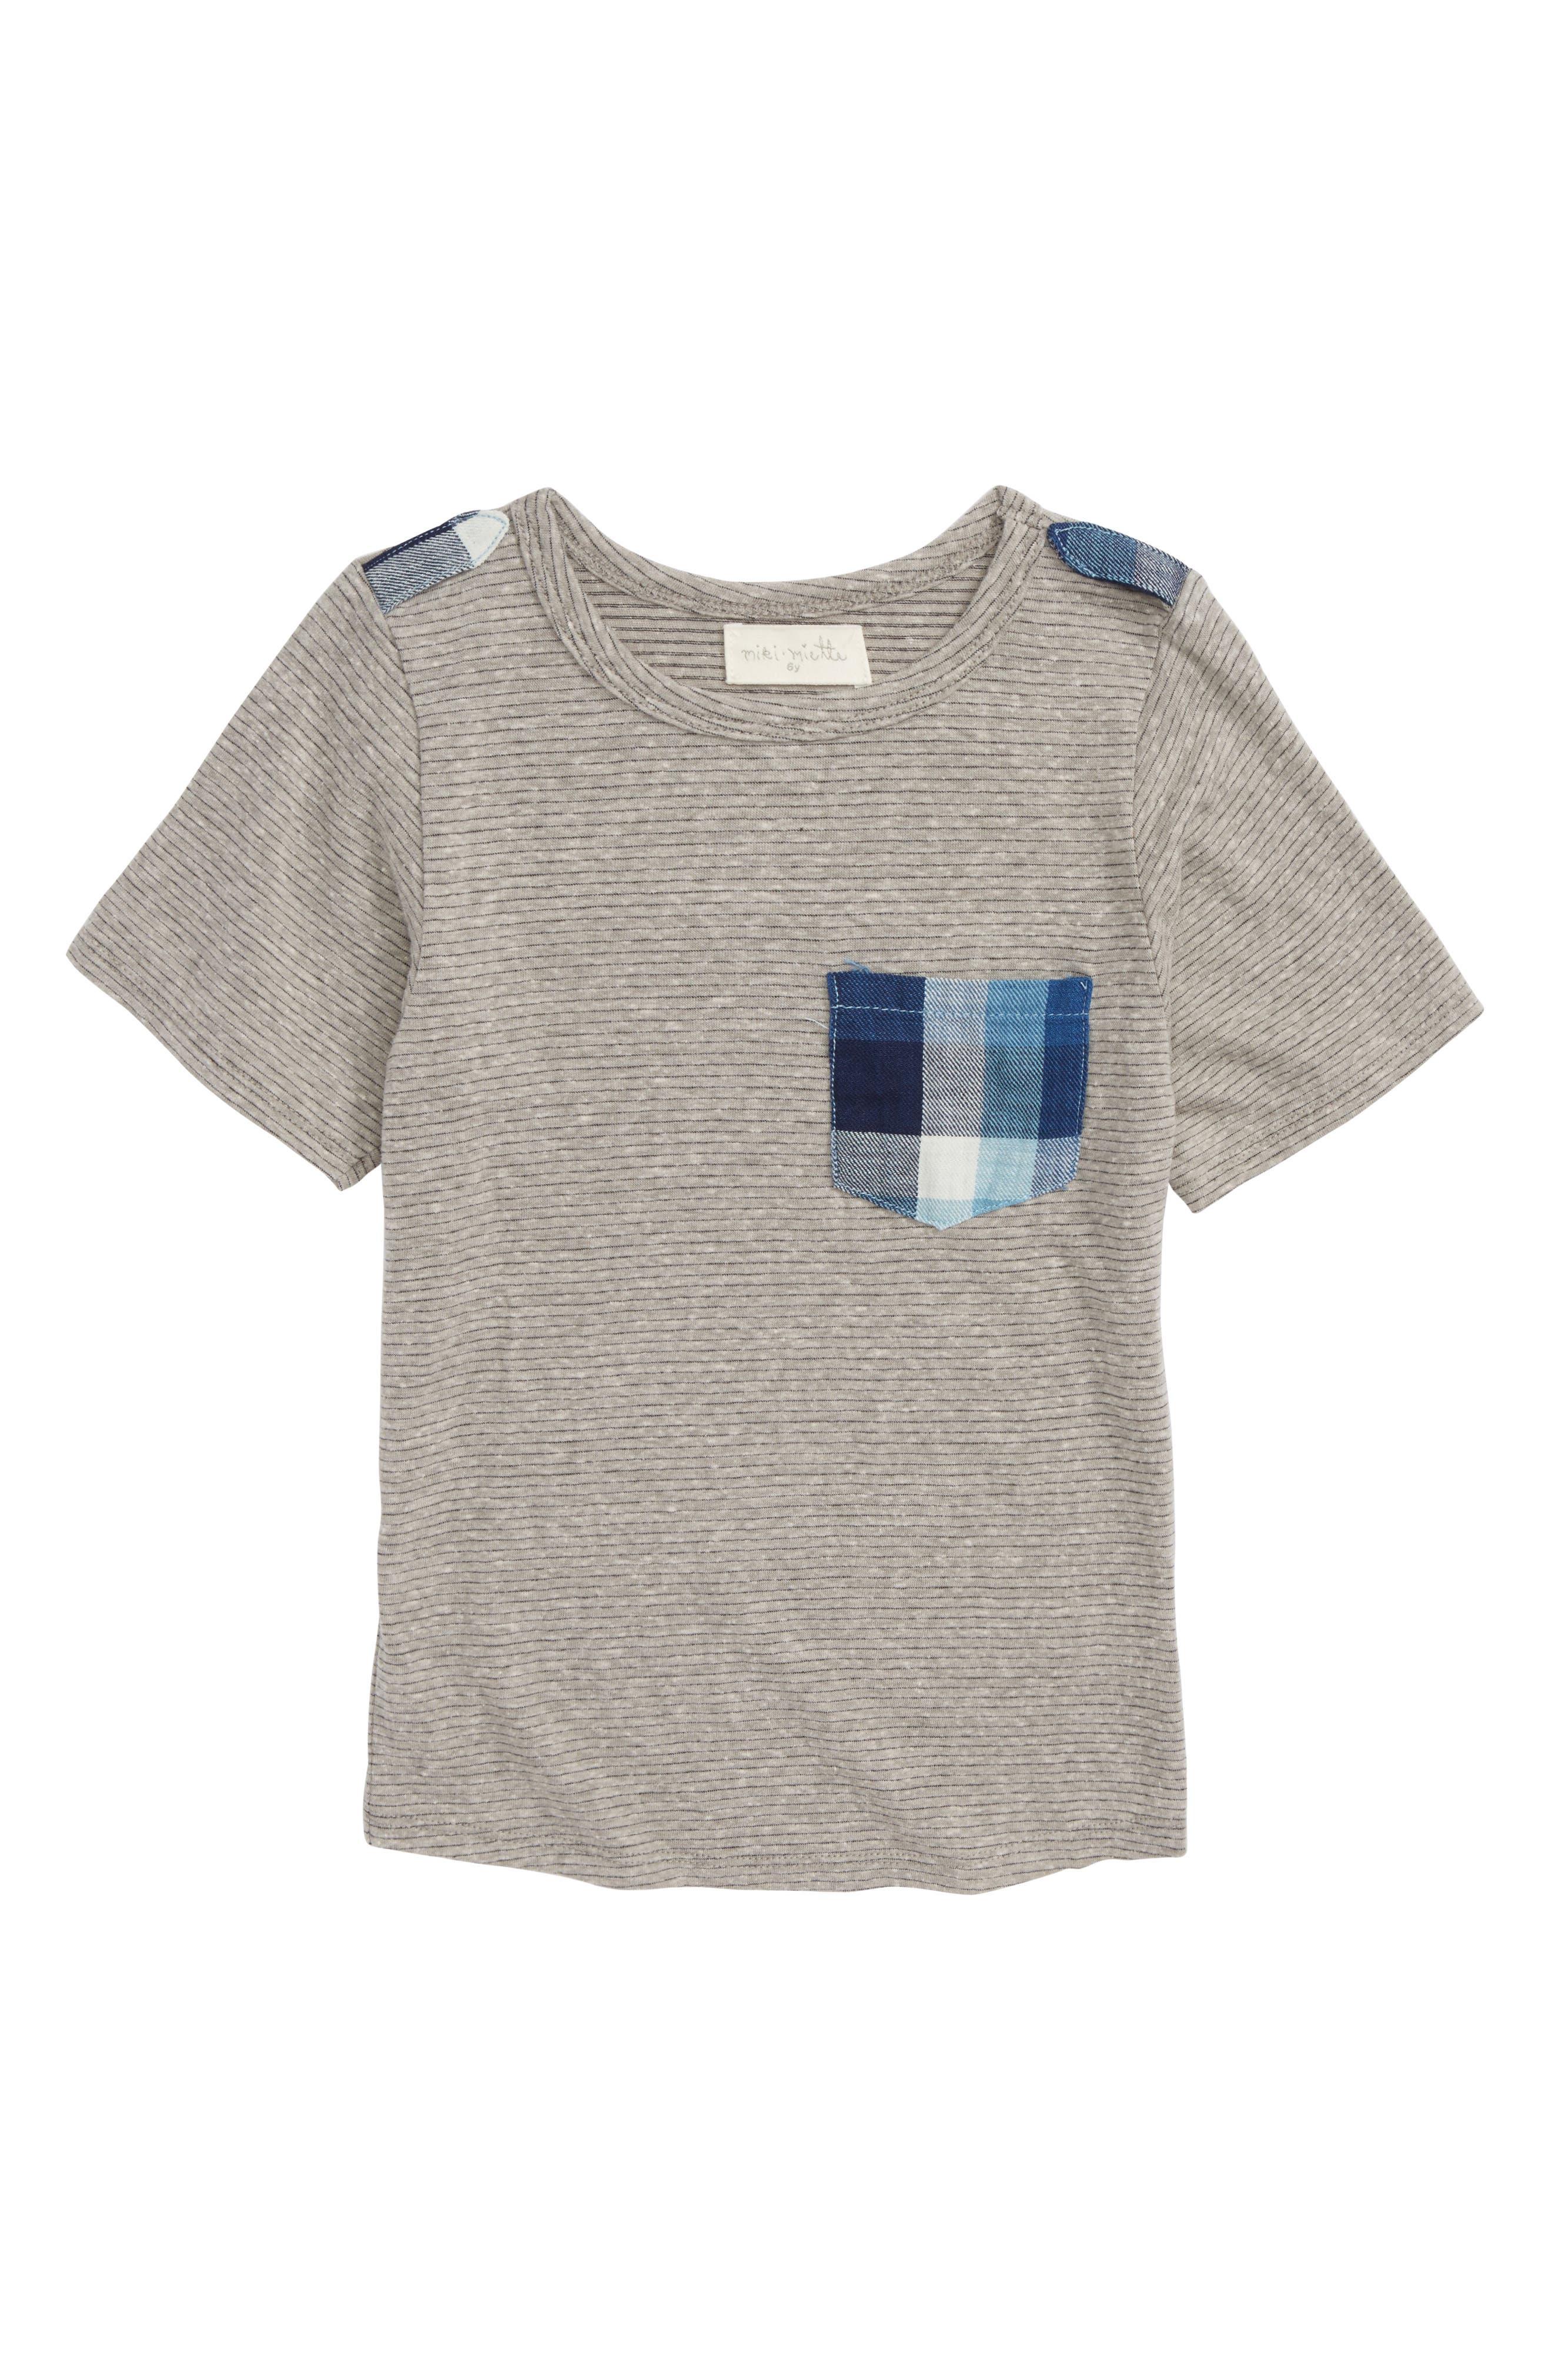 Miki Miette Ranger Pocket T-Shirt (Toddler Boys, Little Boys & Big Boys)